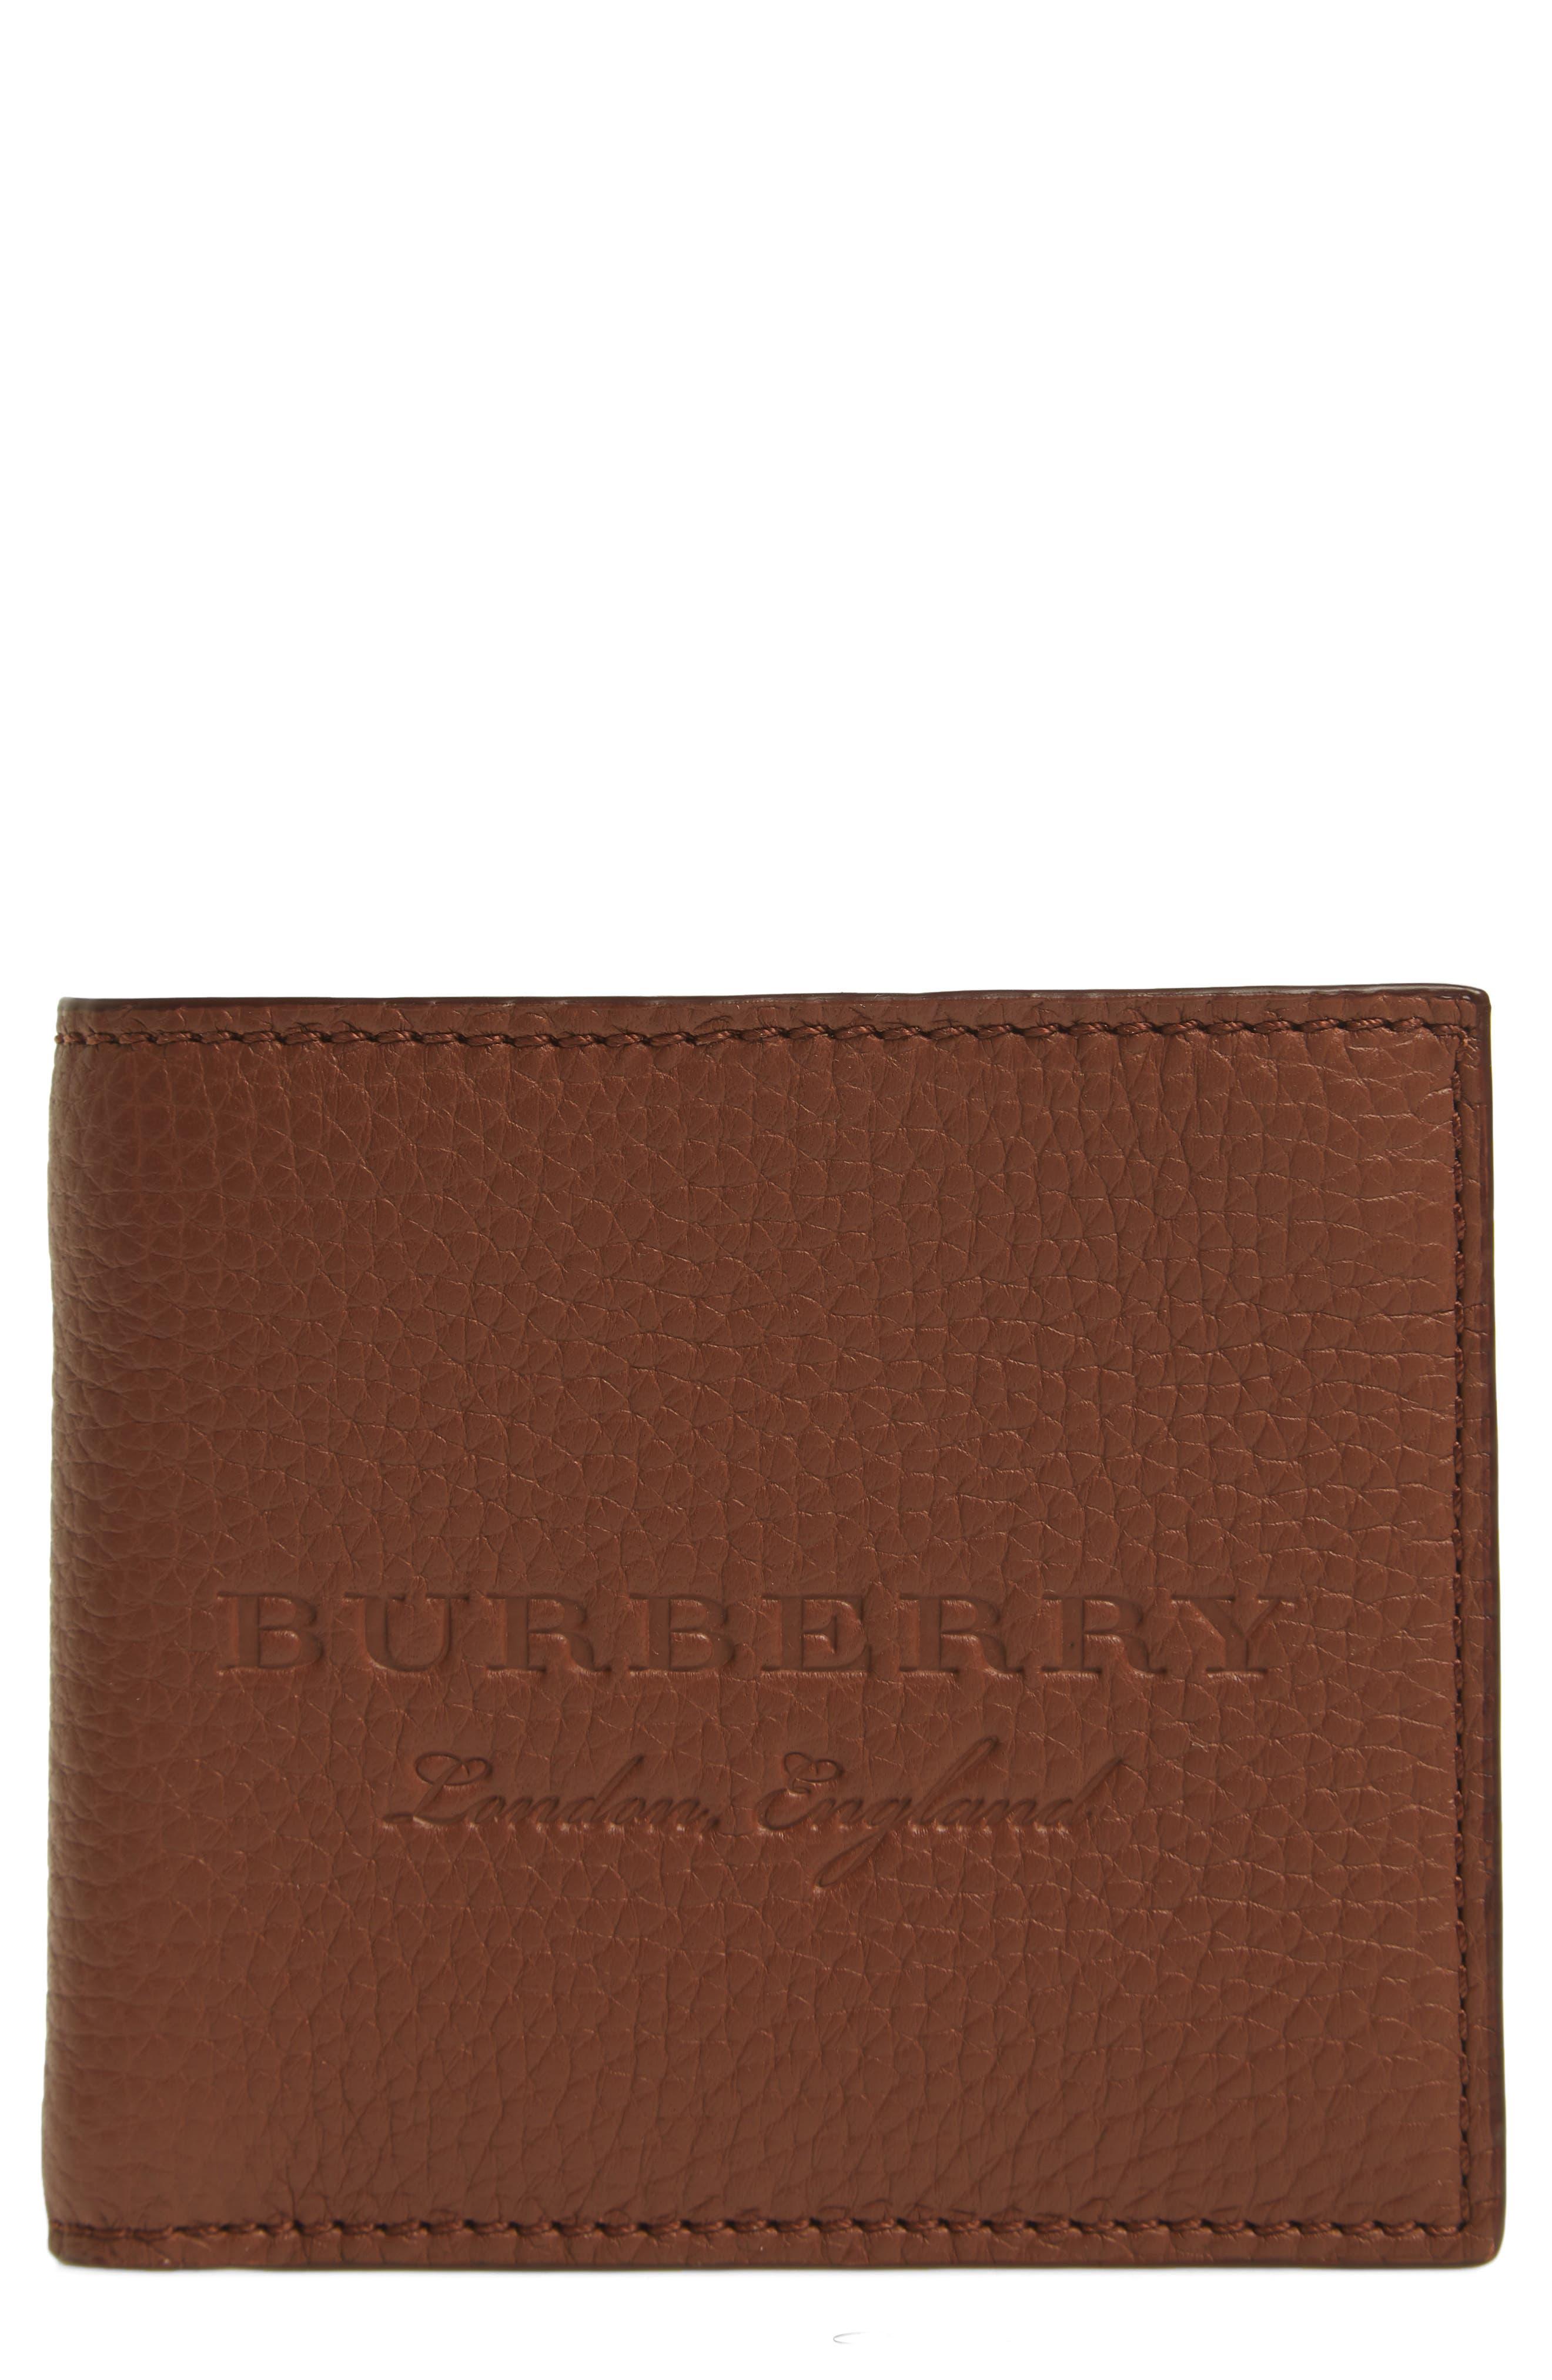 Billfold Wallet,                         Main,                         color, Chestnut Brown